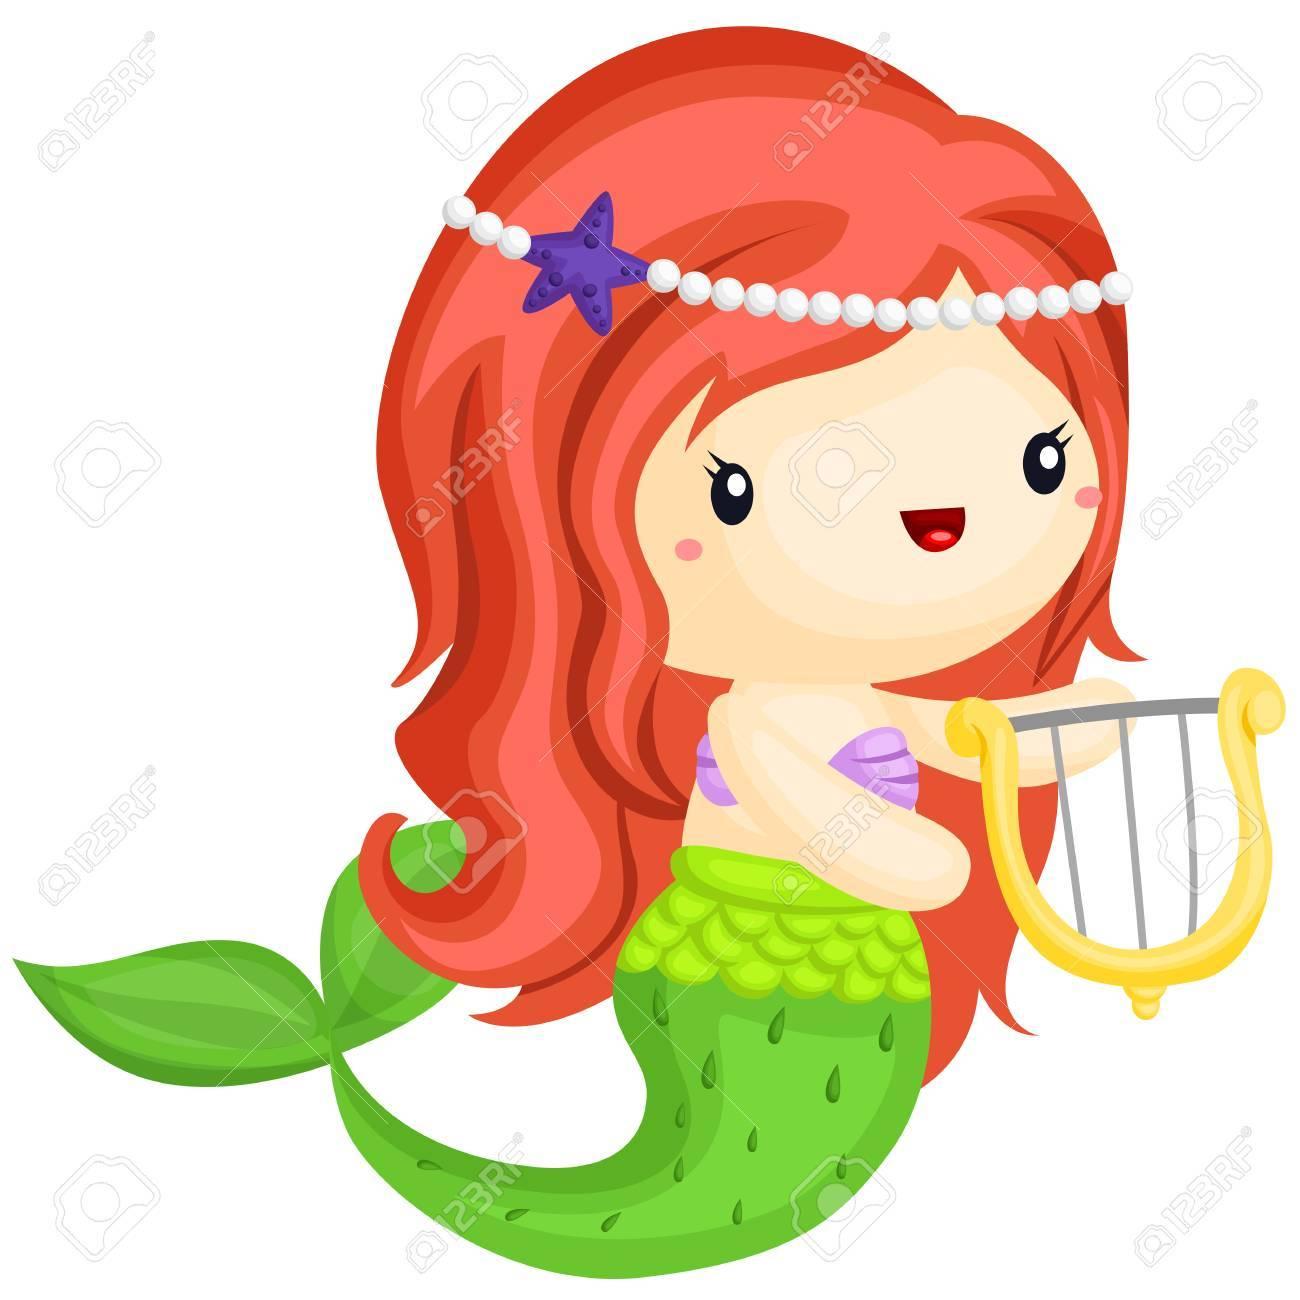 Happy Mermaid - 88265605